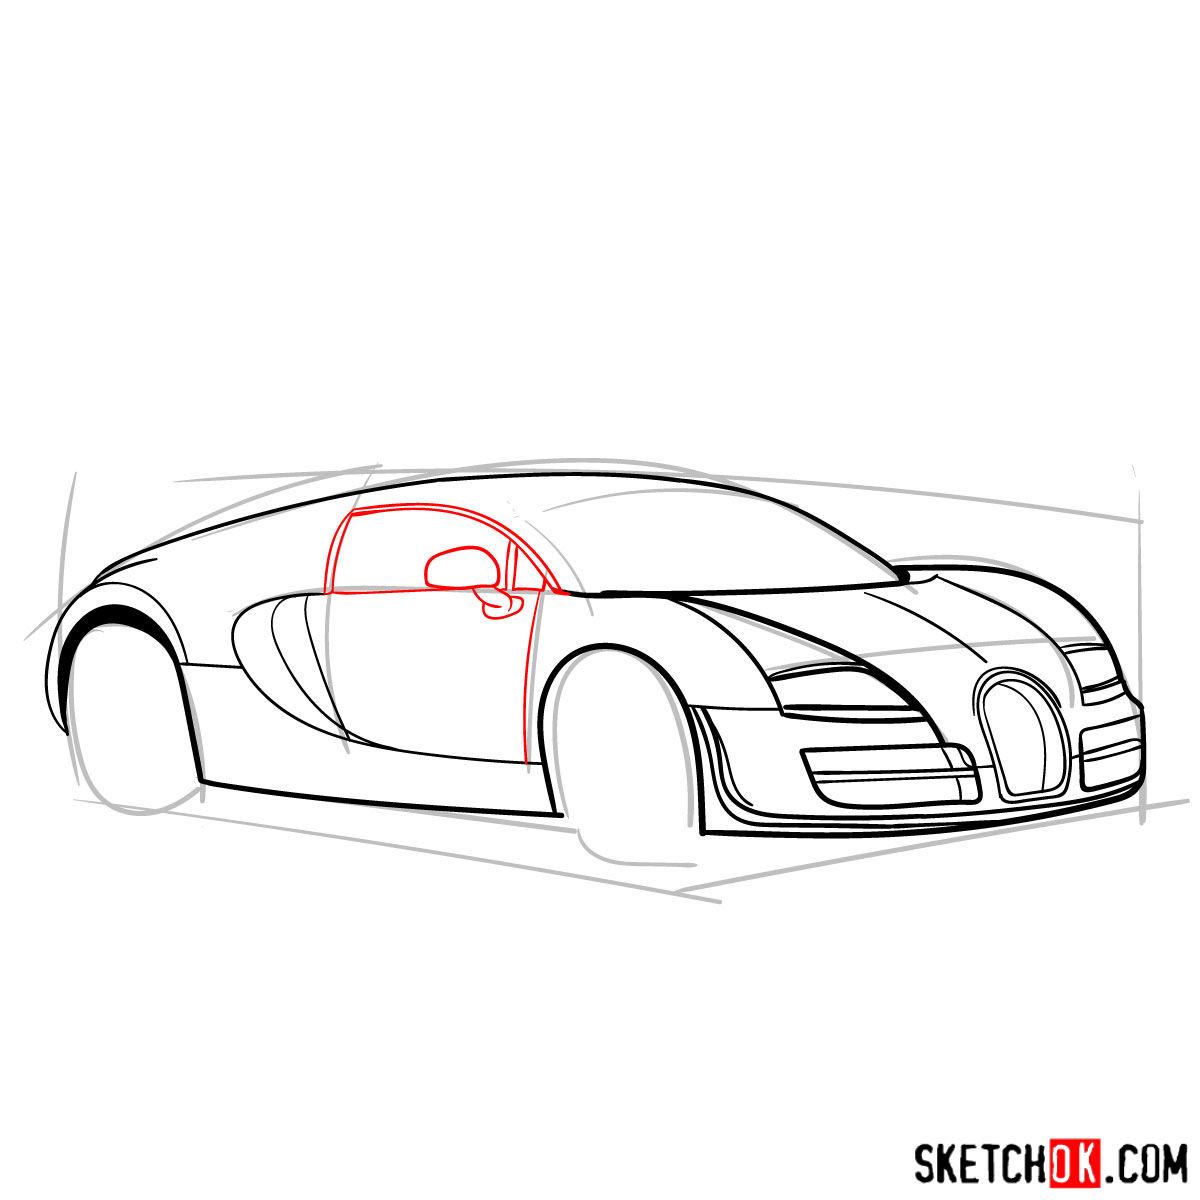 How to draw Bugatti Veyron 16.4 Super Sport - step 08